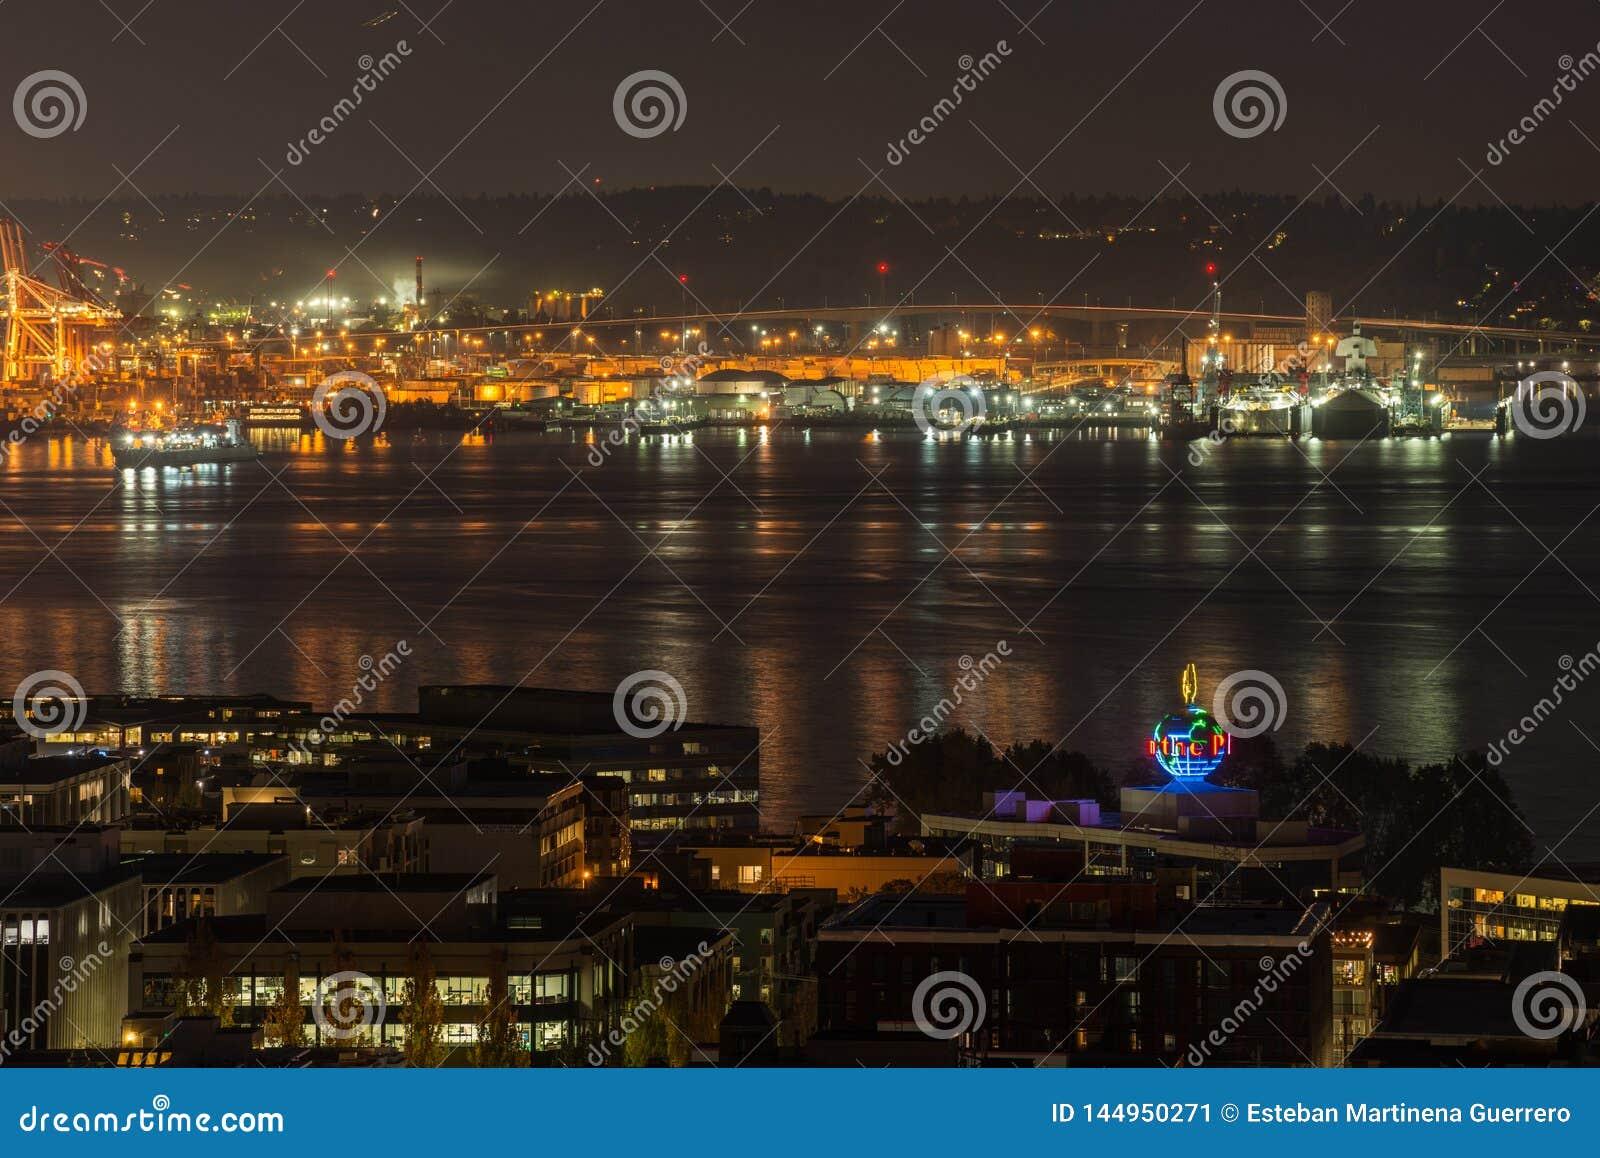 Orange lights iluminate the port of Seattle and Elliott Bay at night.